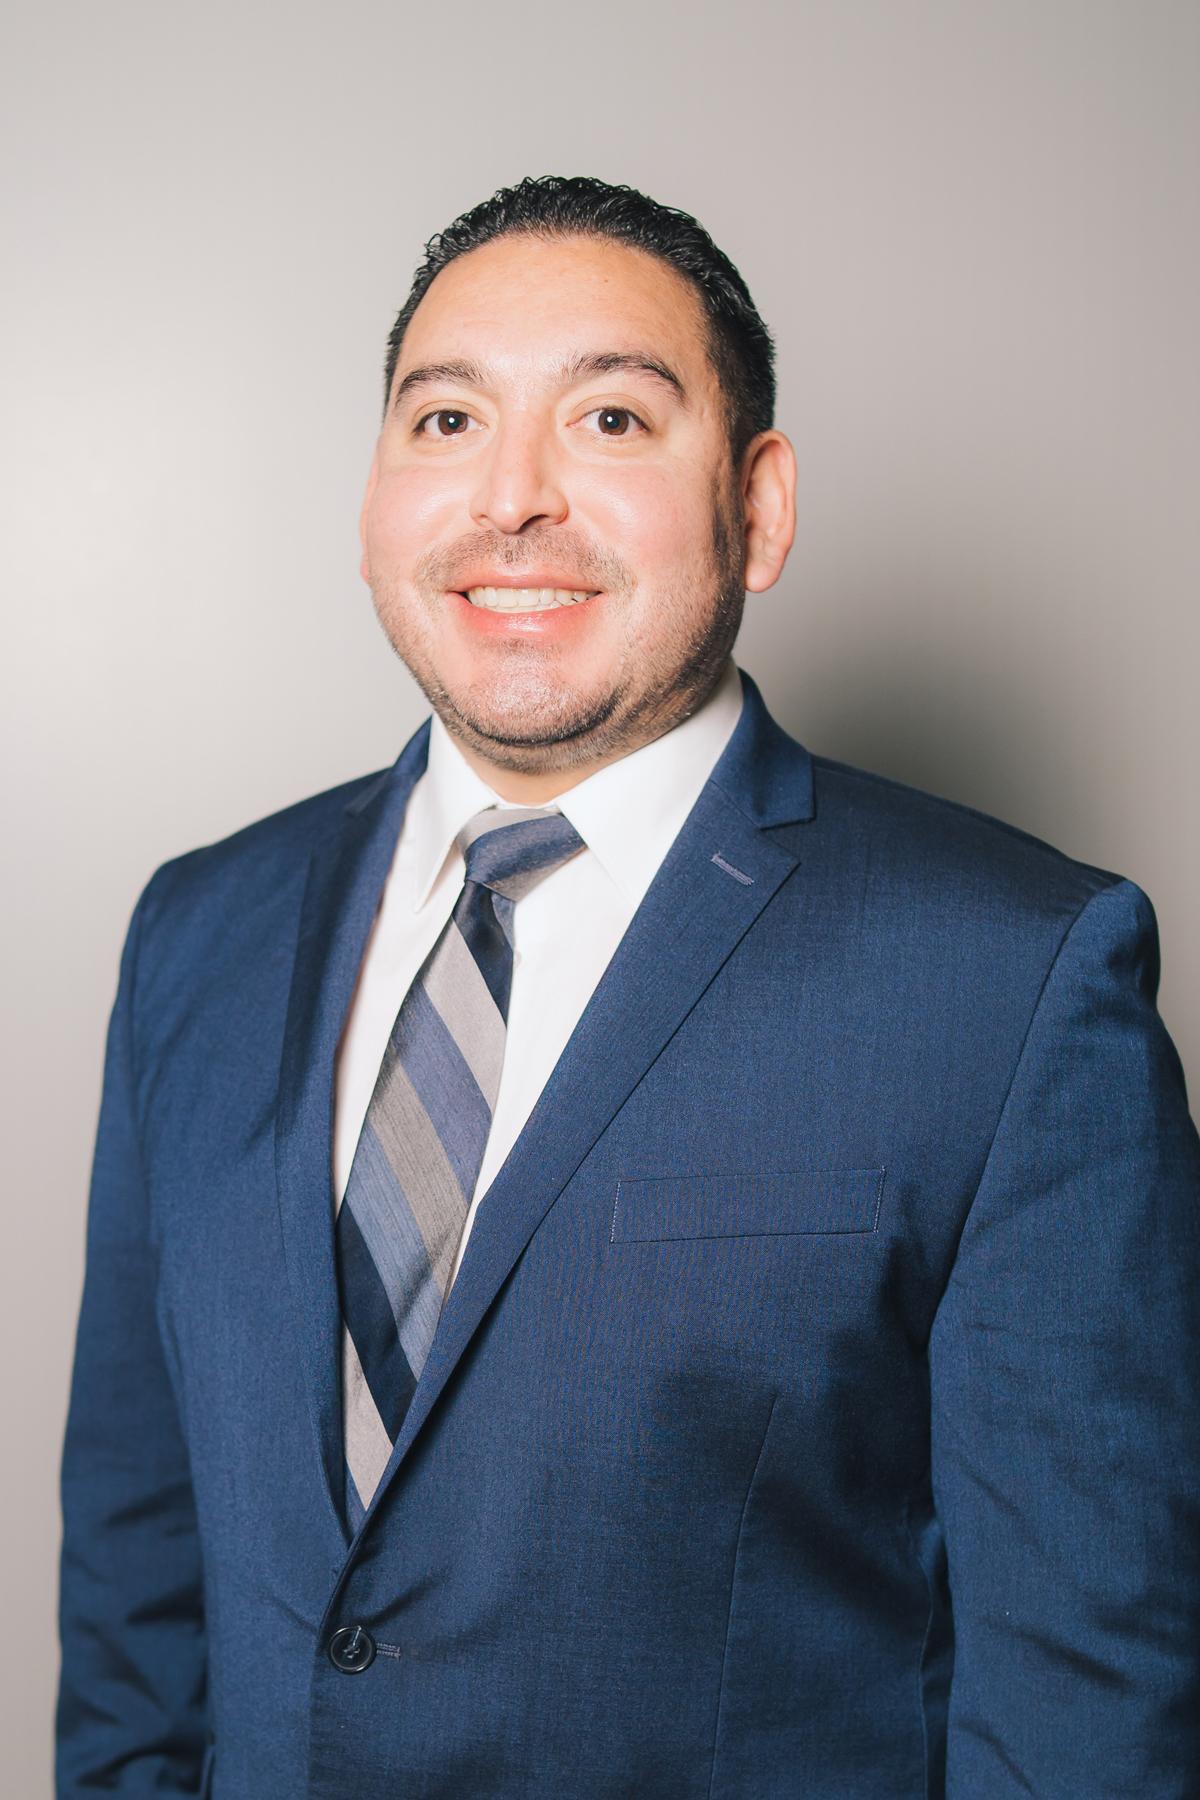 Hector Betancourt Case Manager Intake Specialist